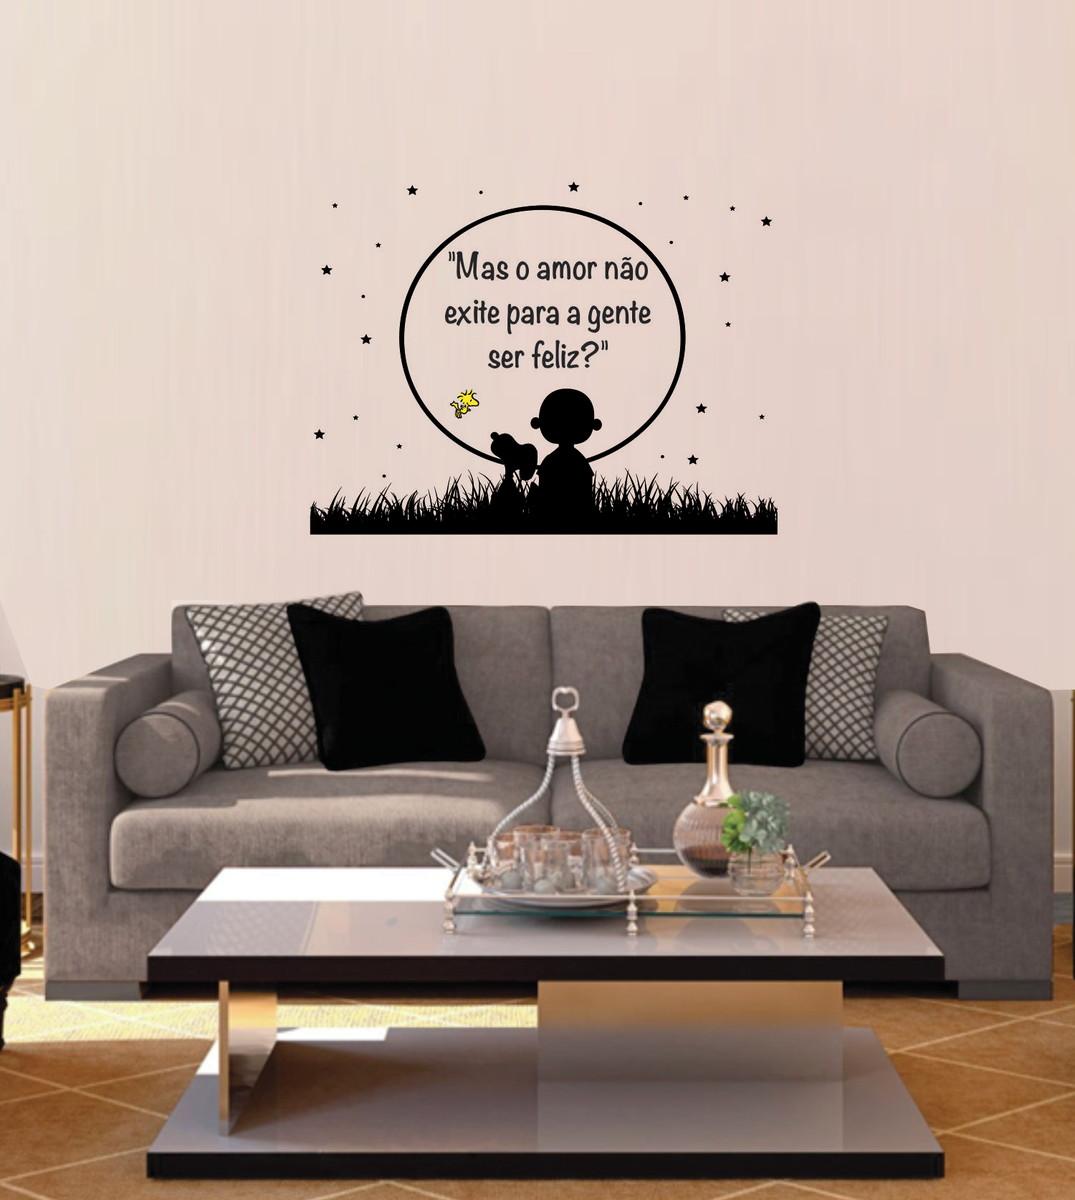 Adesivo Snoopy E Charlie Brown No Luar Frase